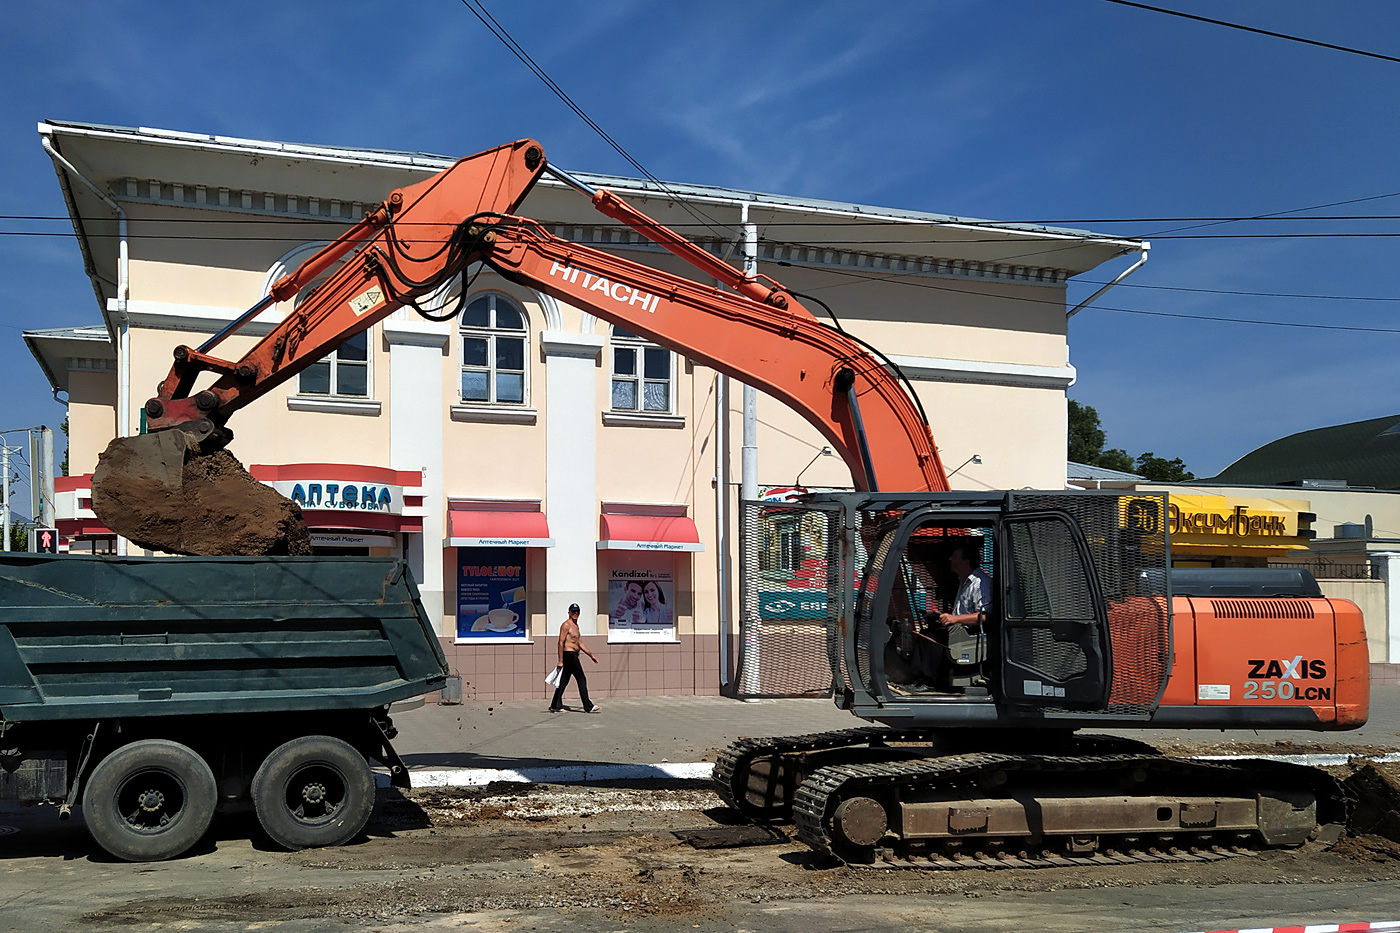 Экскаватор Hitachi Zaxis 250LCN. Приднестровье, Бендеры, улица Сергея Лазо